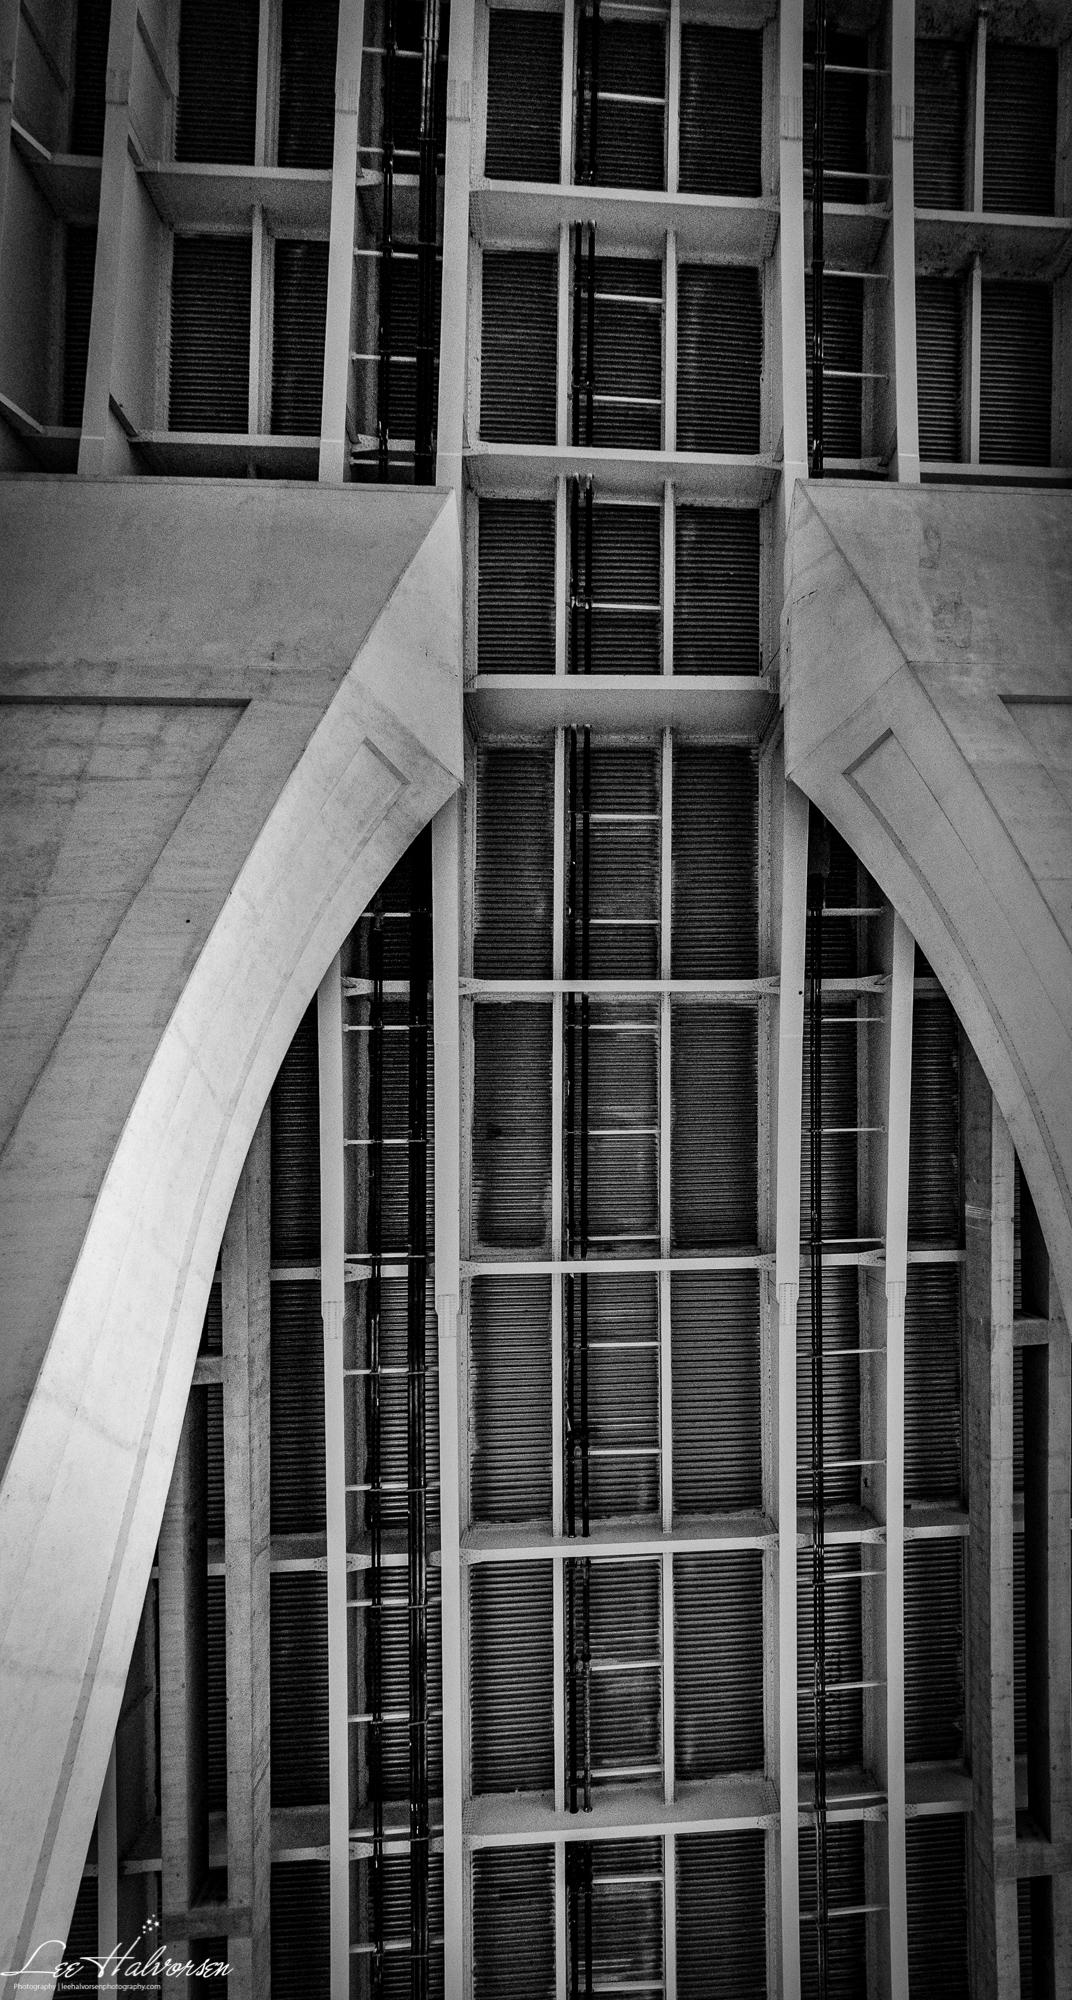 Looking Straight Up at the Woodrow Wilson Bridge